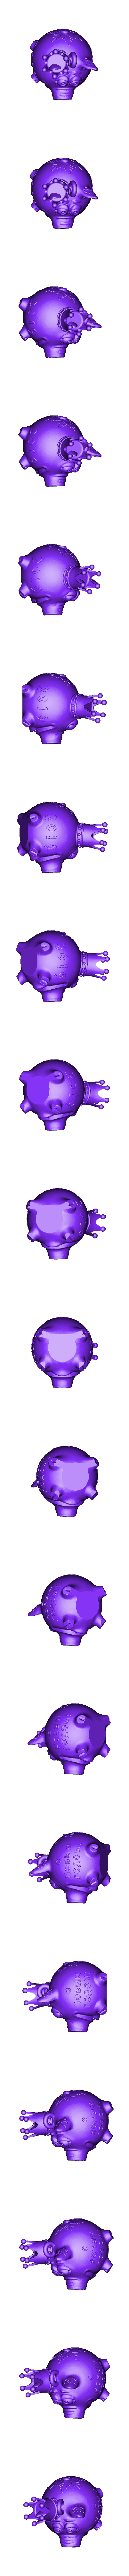 koroleva_N.stl Download free STL file Pig Royal Family • 3D printer model, shuranikishin